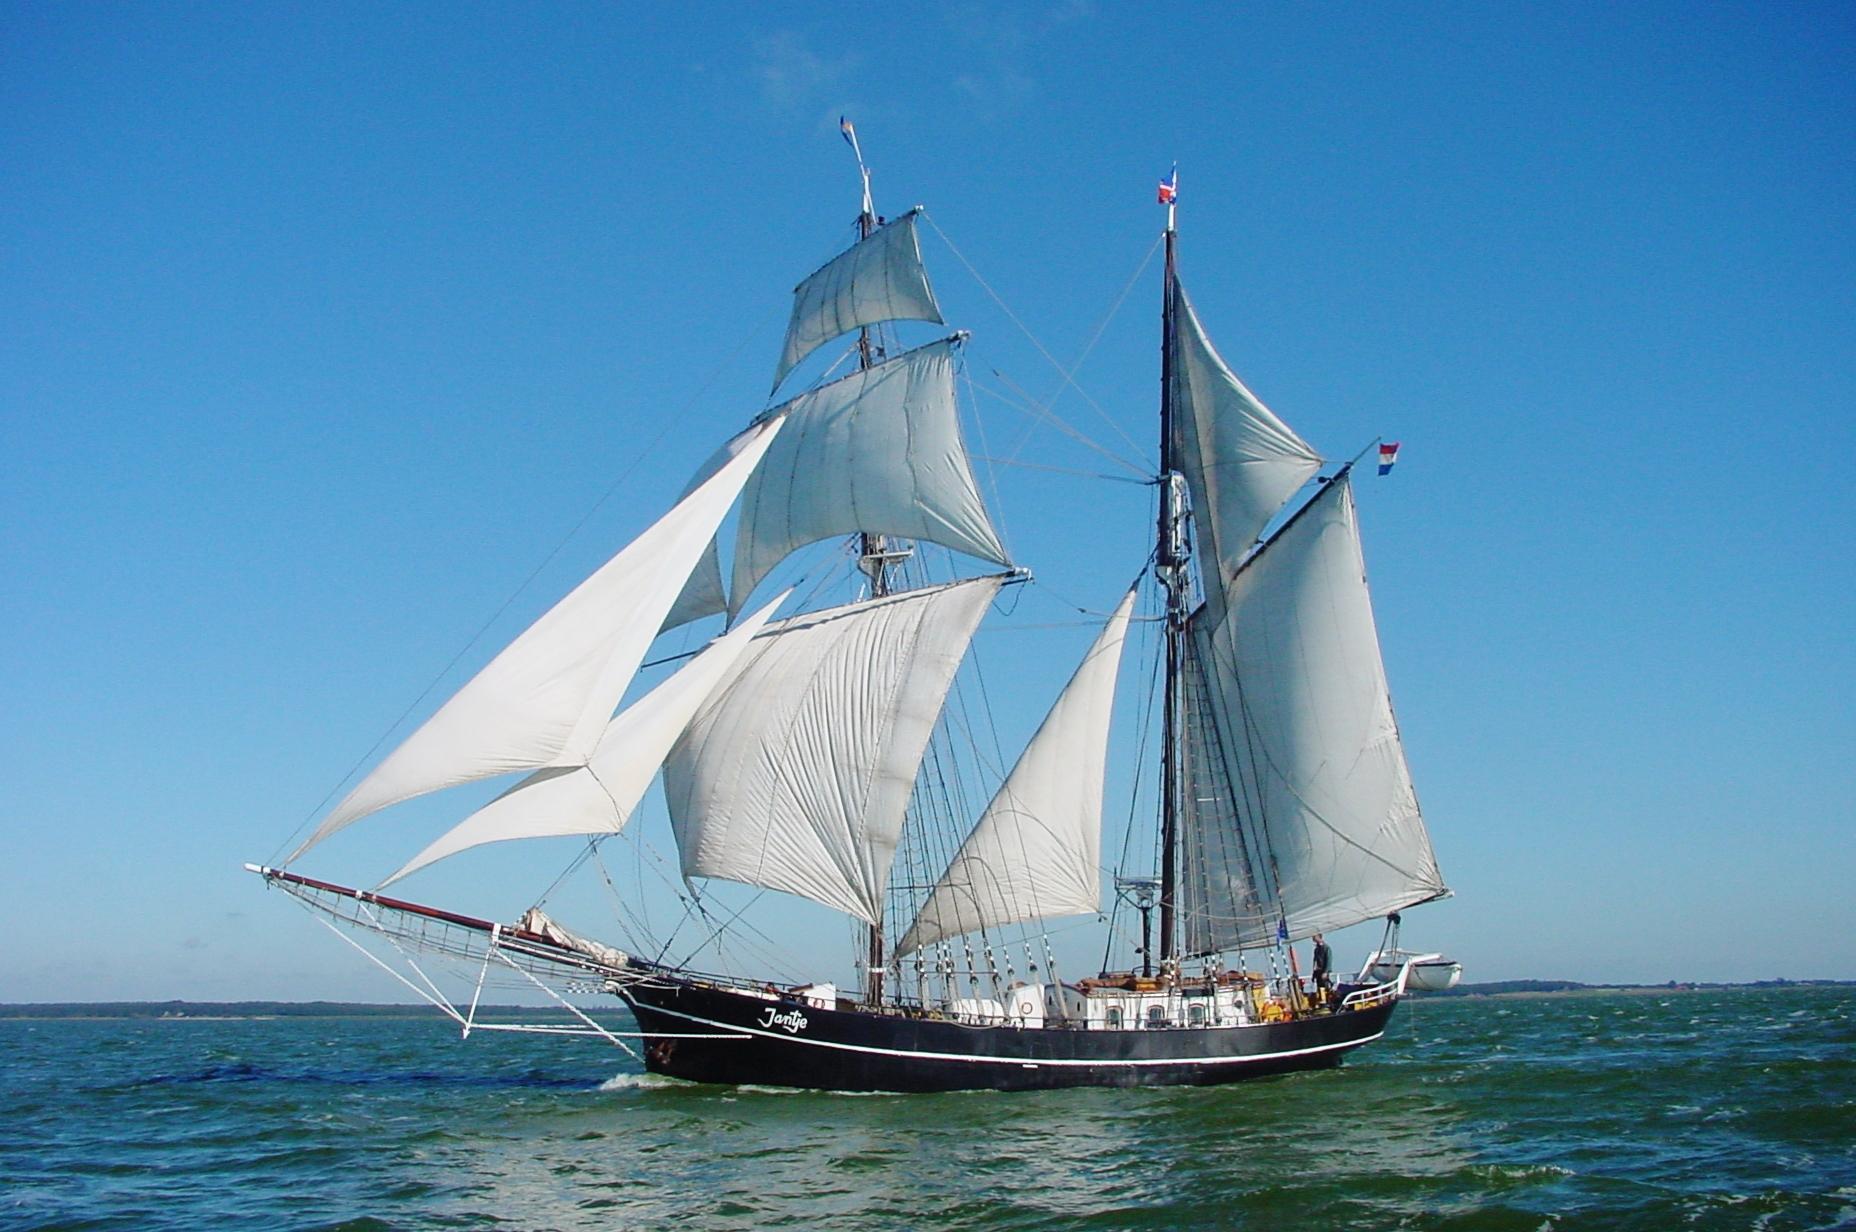 Zeilschip Jantje